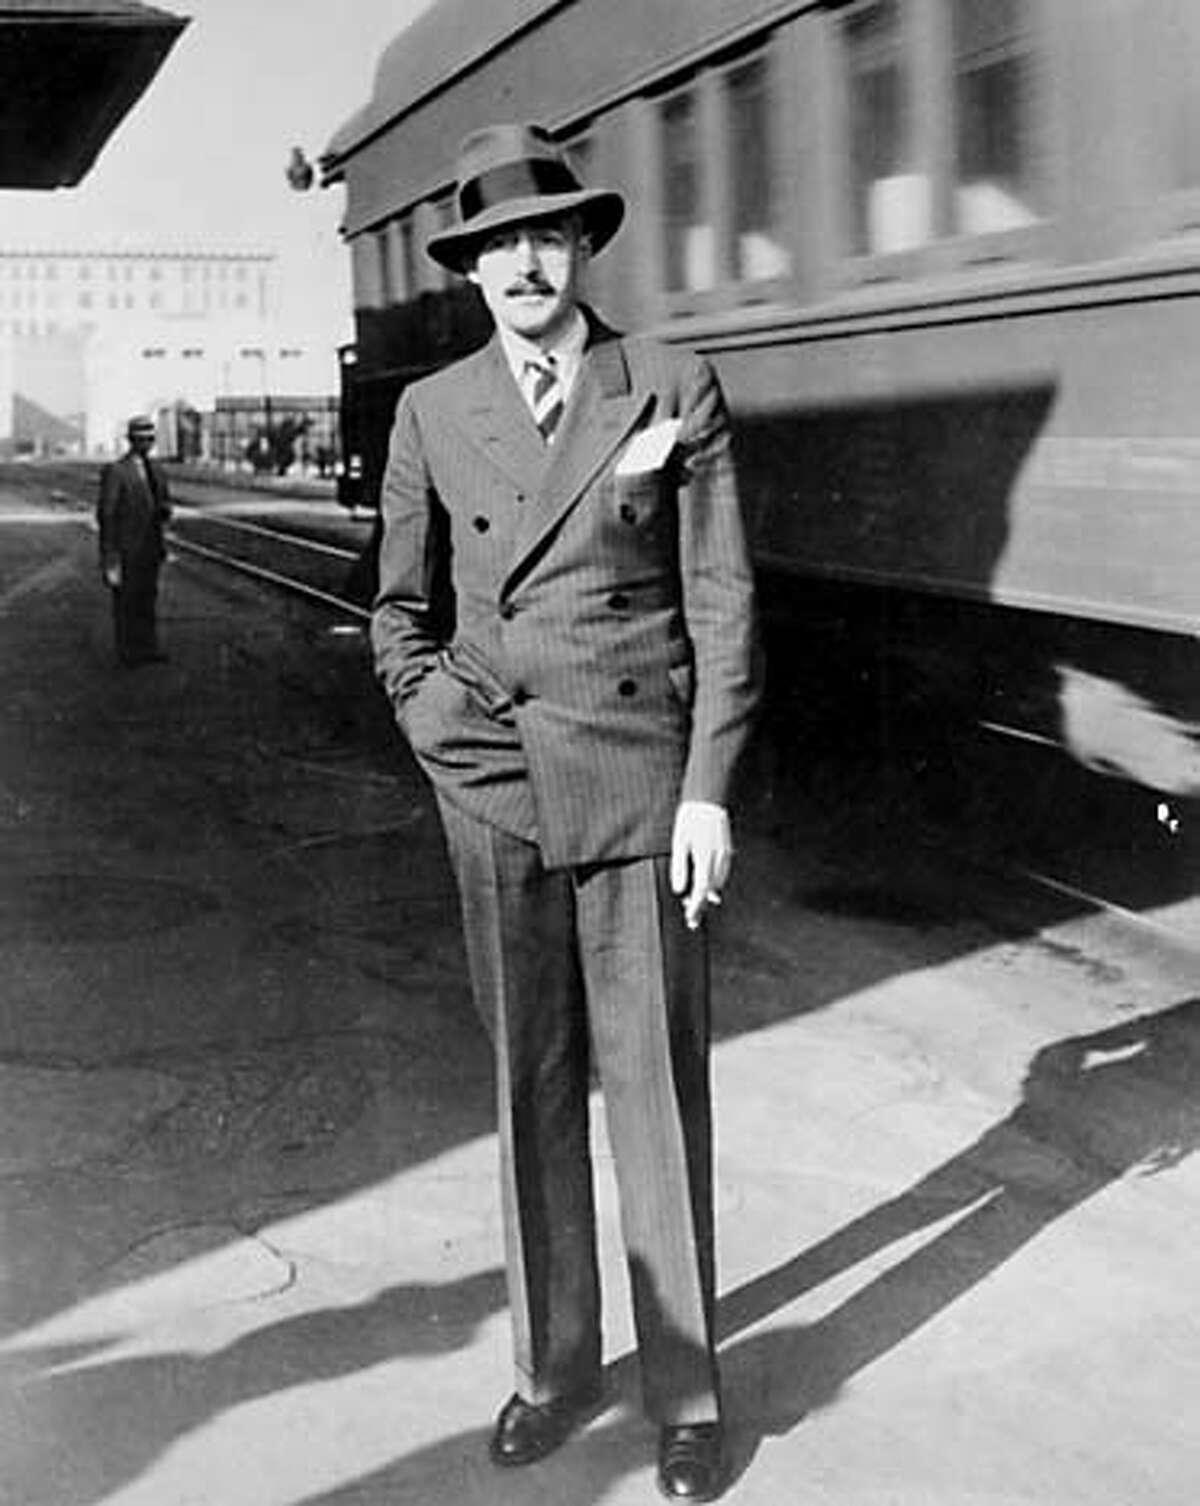 CENTURY25B/B/16APR99/SC/HO--Dashiell Hammett on his arrival in Hollywood (c. 1940) to write film scripts. Photo from SHADOW MAN:The life of Dashiell Hammett, by Richard Layman, 1981. PHOTO COURTESY SPRINGER/BETTMAN FILM ARCHIVE. CAT Datebook#Datebook#SundayDateBook#10/31/2004#ALL#Advance##422017065